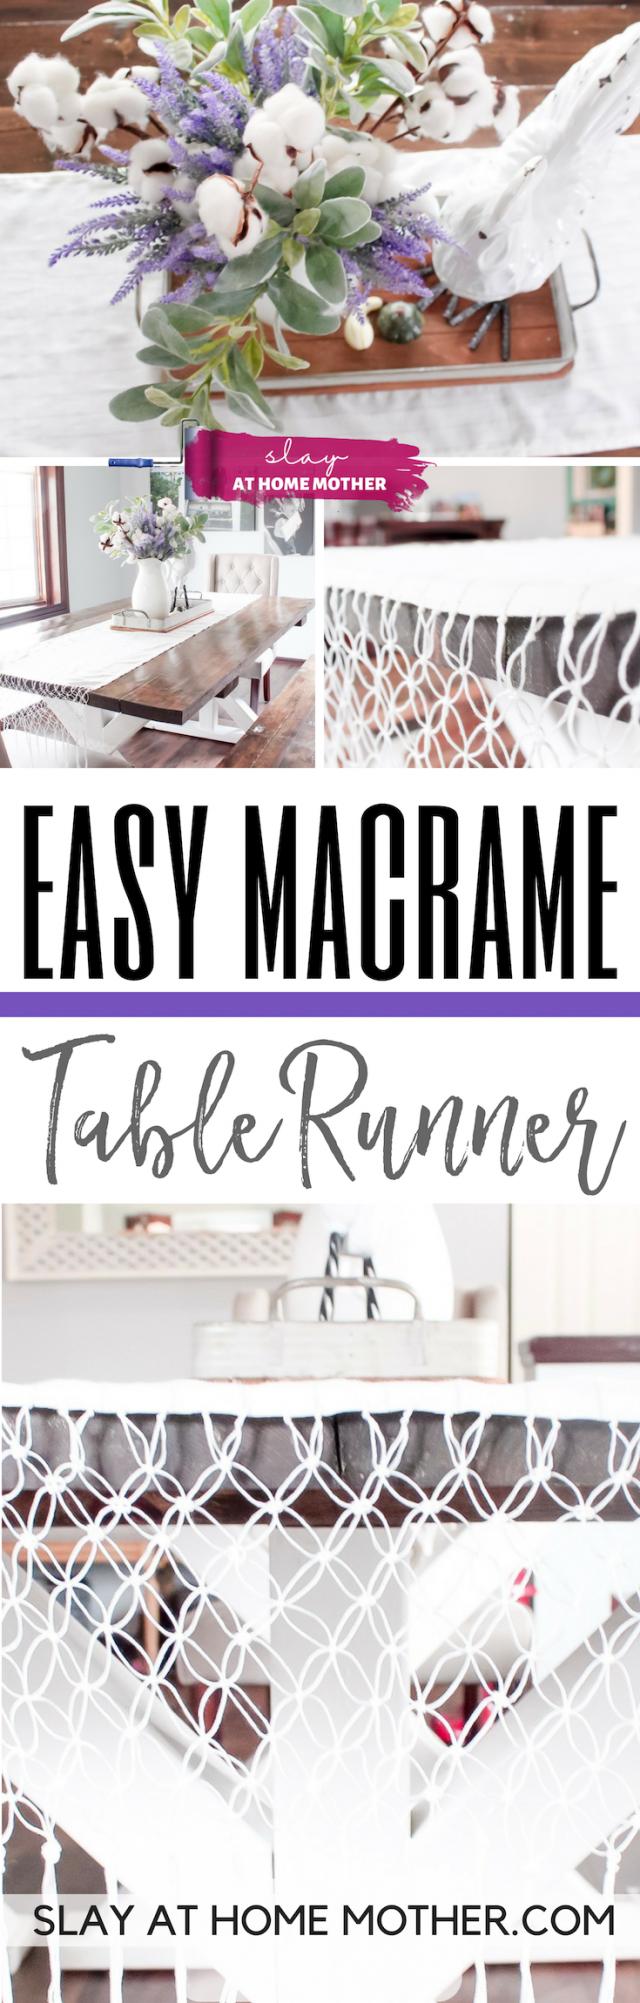 Easy Macrame Table Runner #macrame #tablerunner #slayathomemother #diy - SLAYathomemother.com